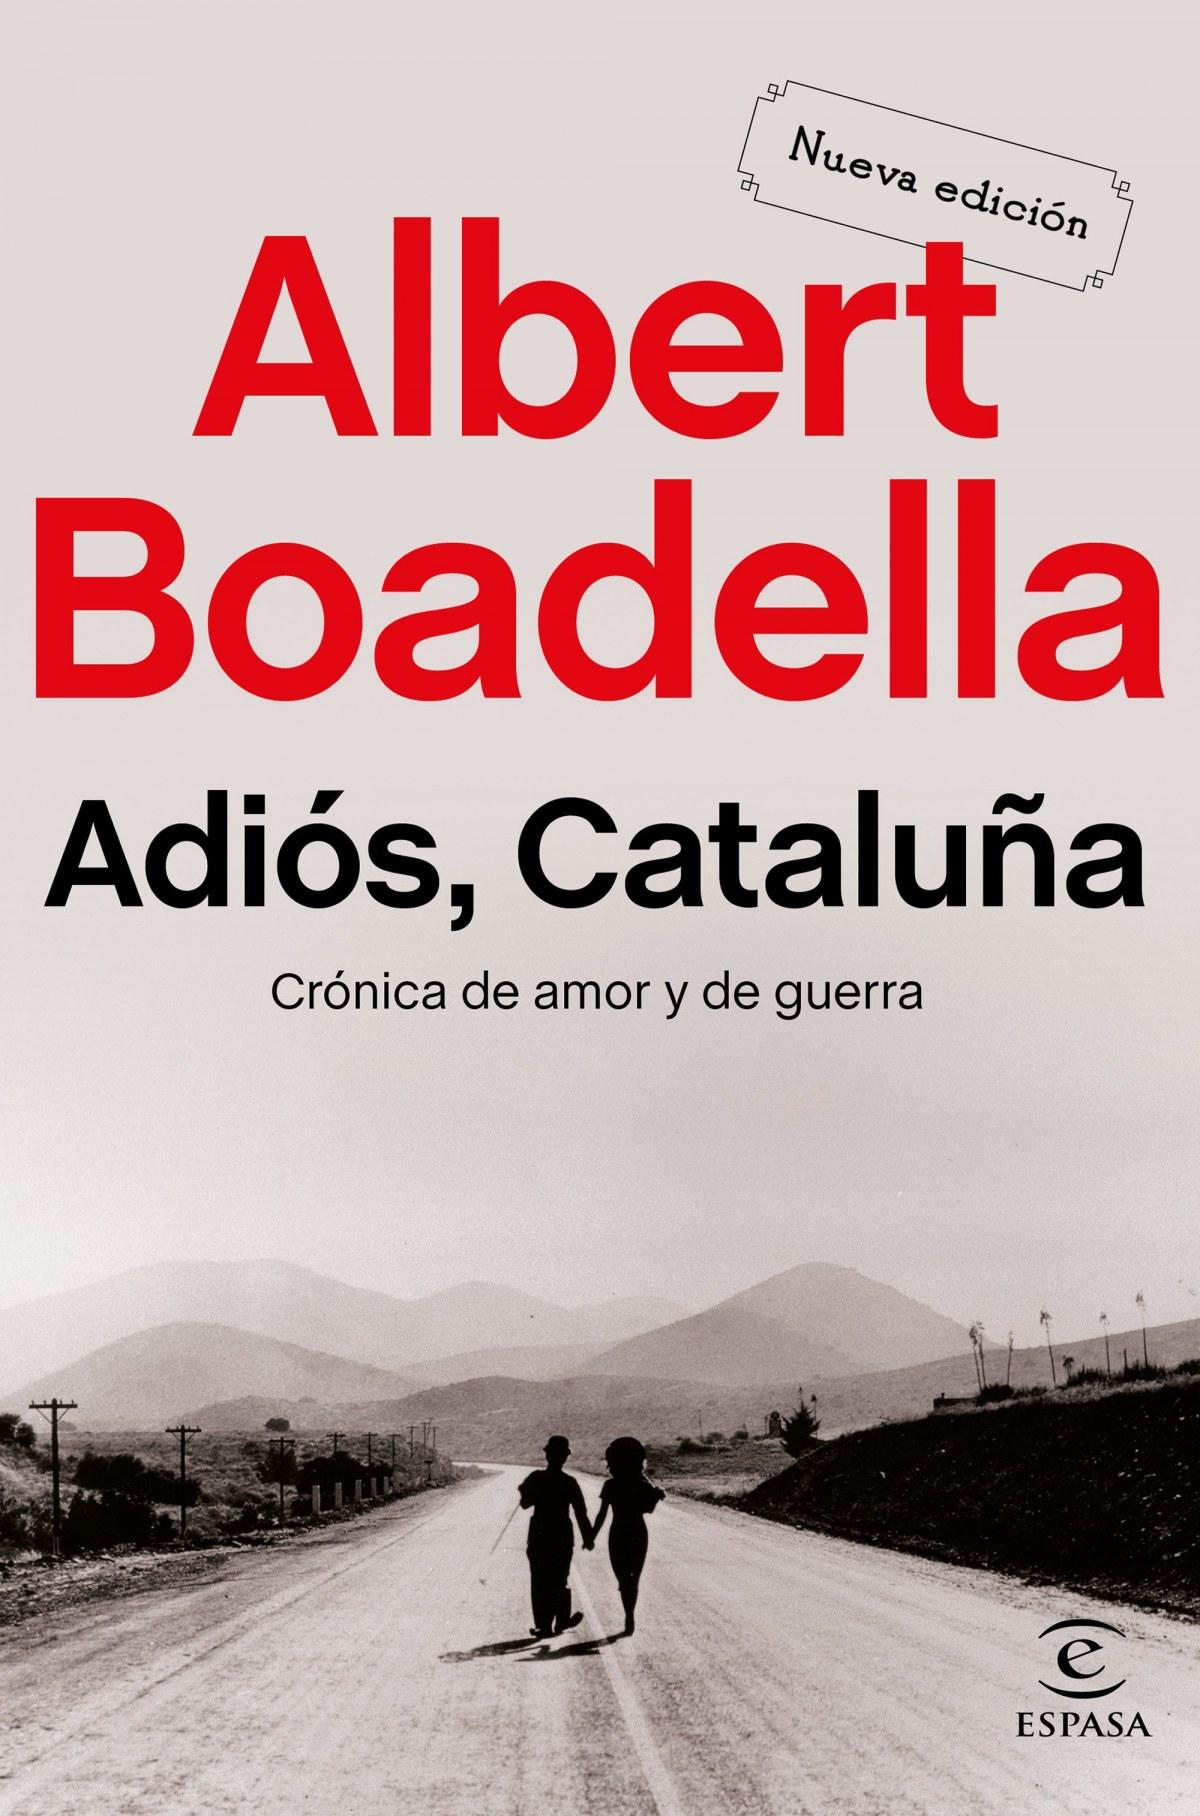 ADIOS, CATALUÑA